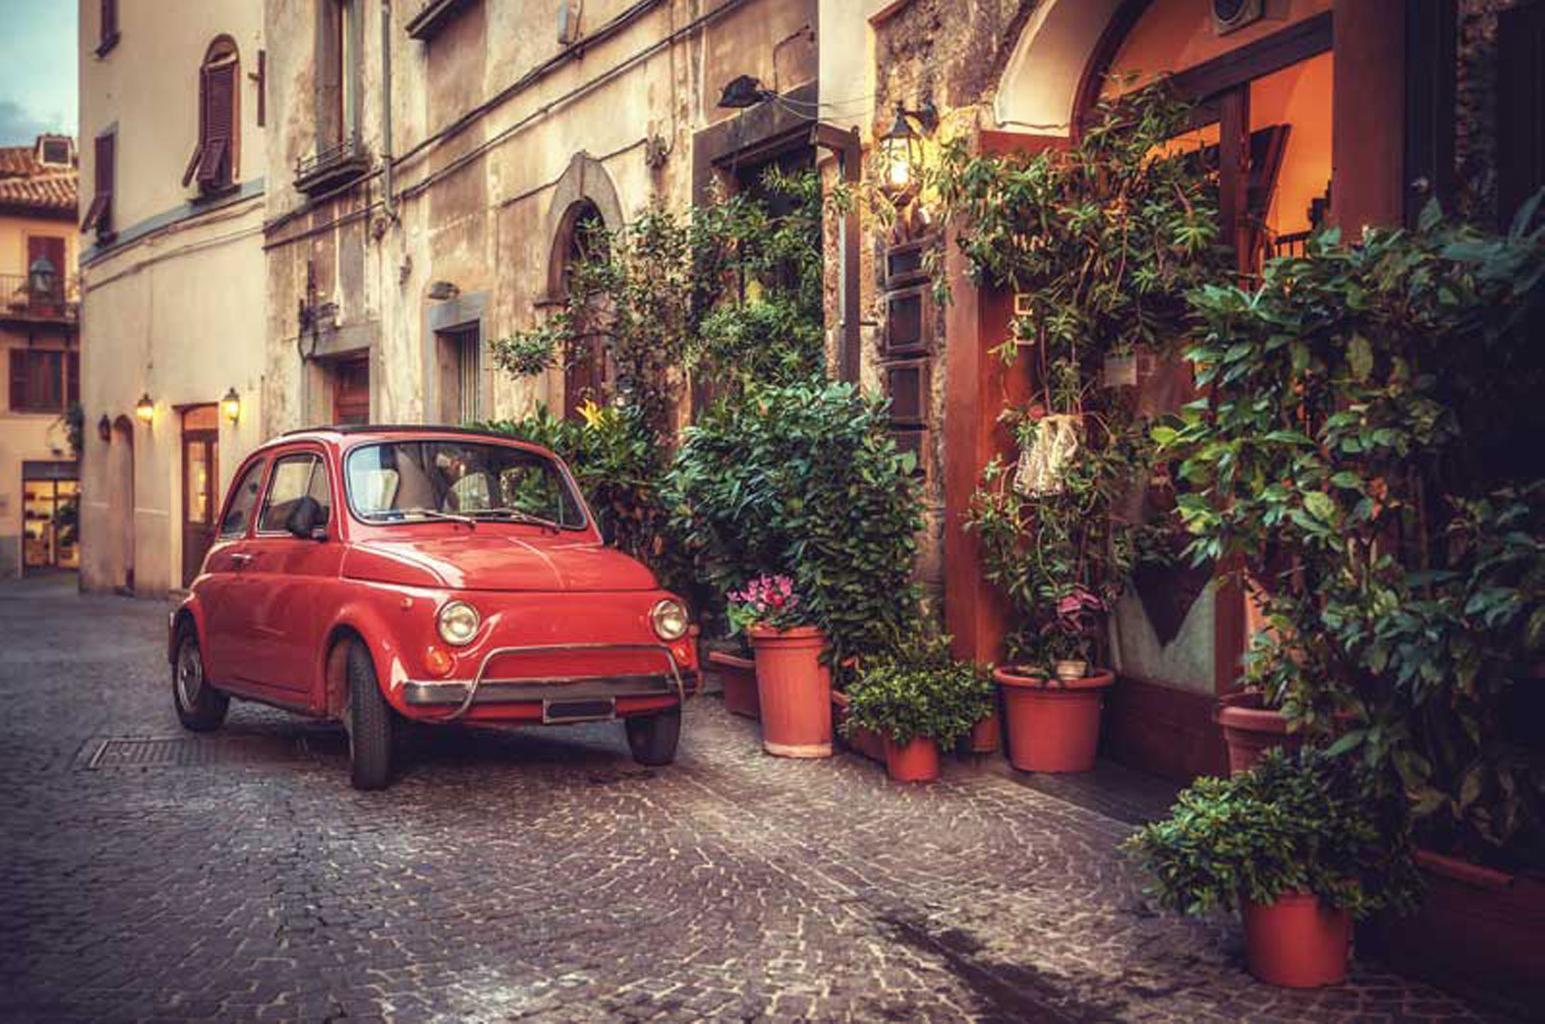 Fiat 500 in Europe